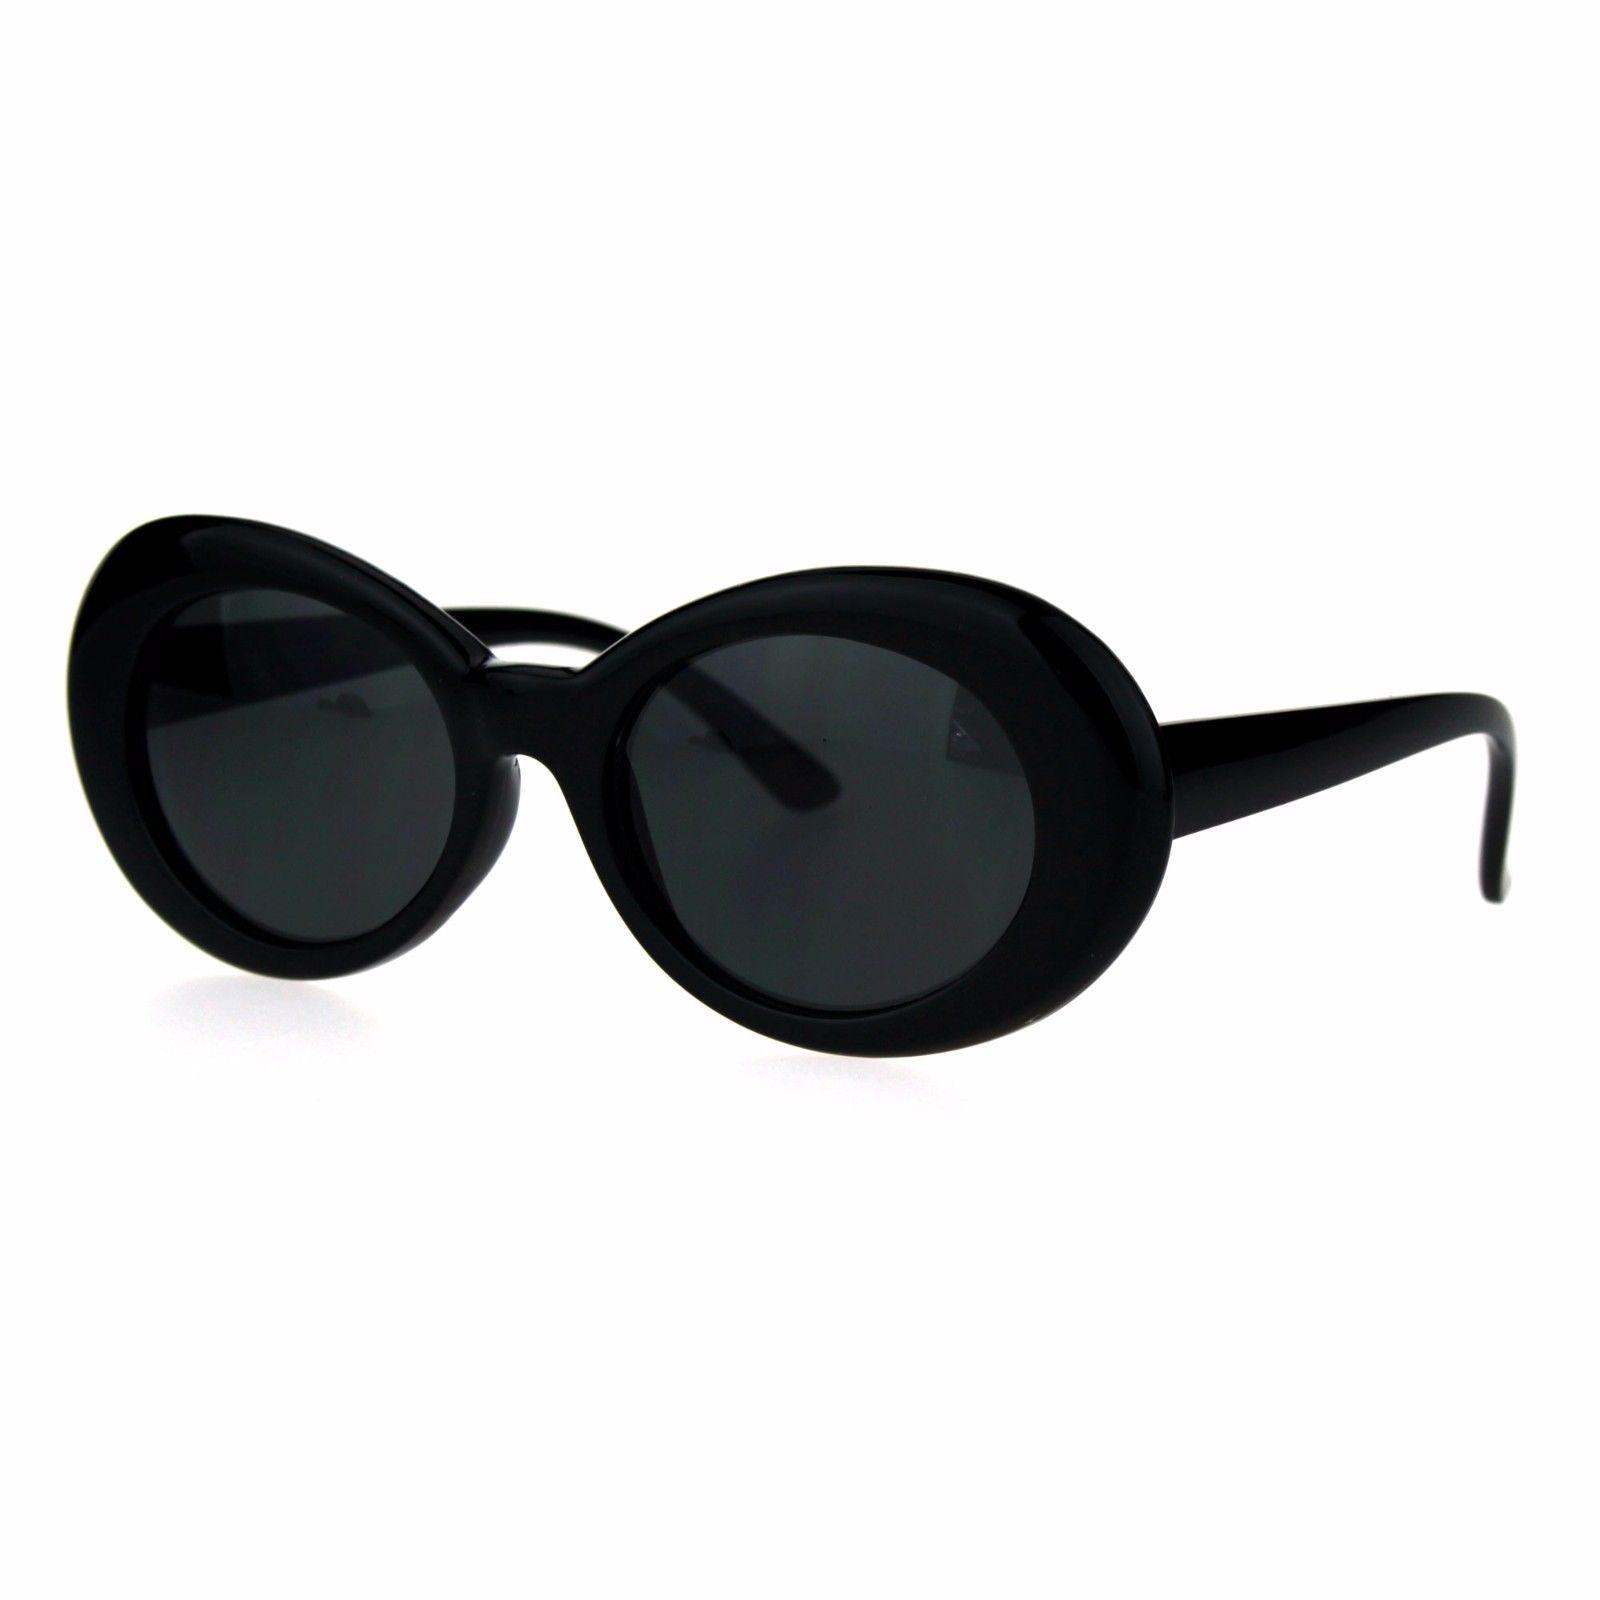 050b67653bb9c Womens Oval Cateye Sunglasse Stylish Vintage Fashion Eyewear UV 400 -  9.95